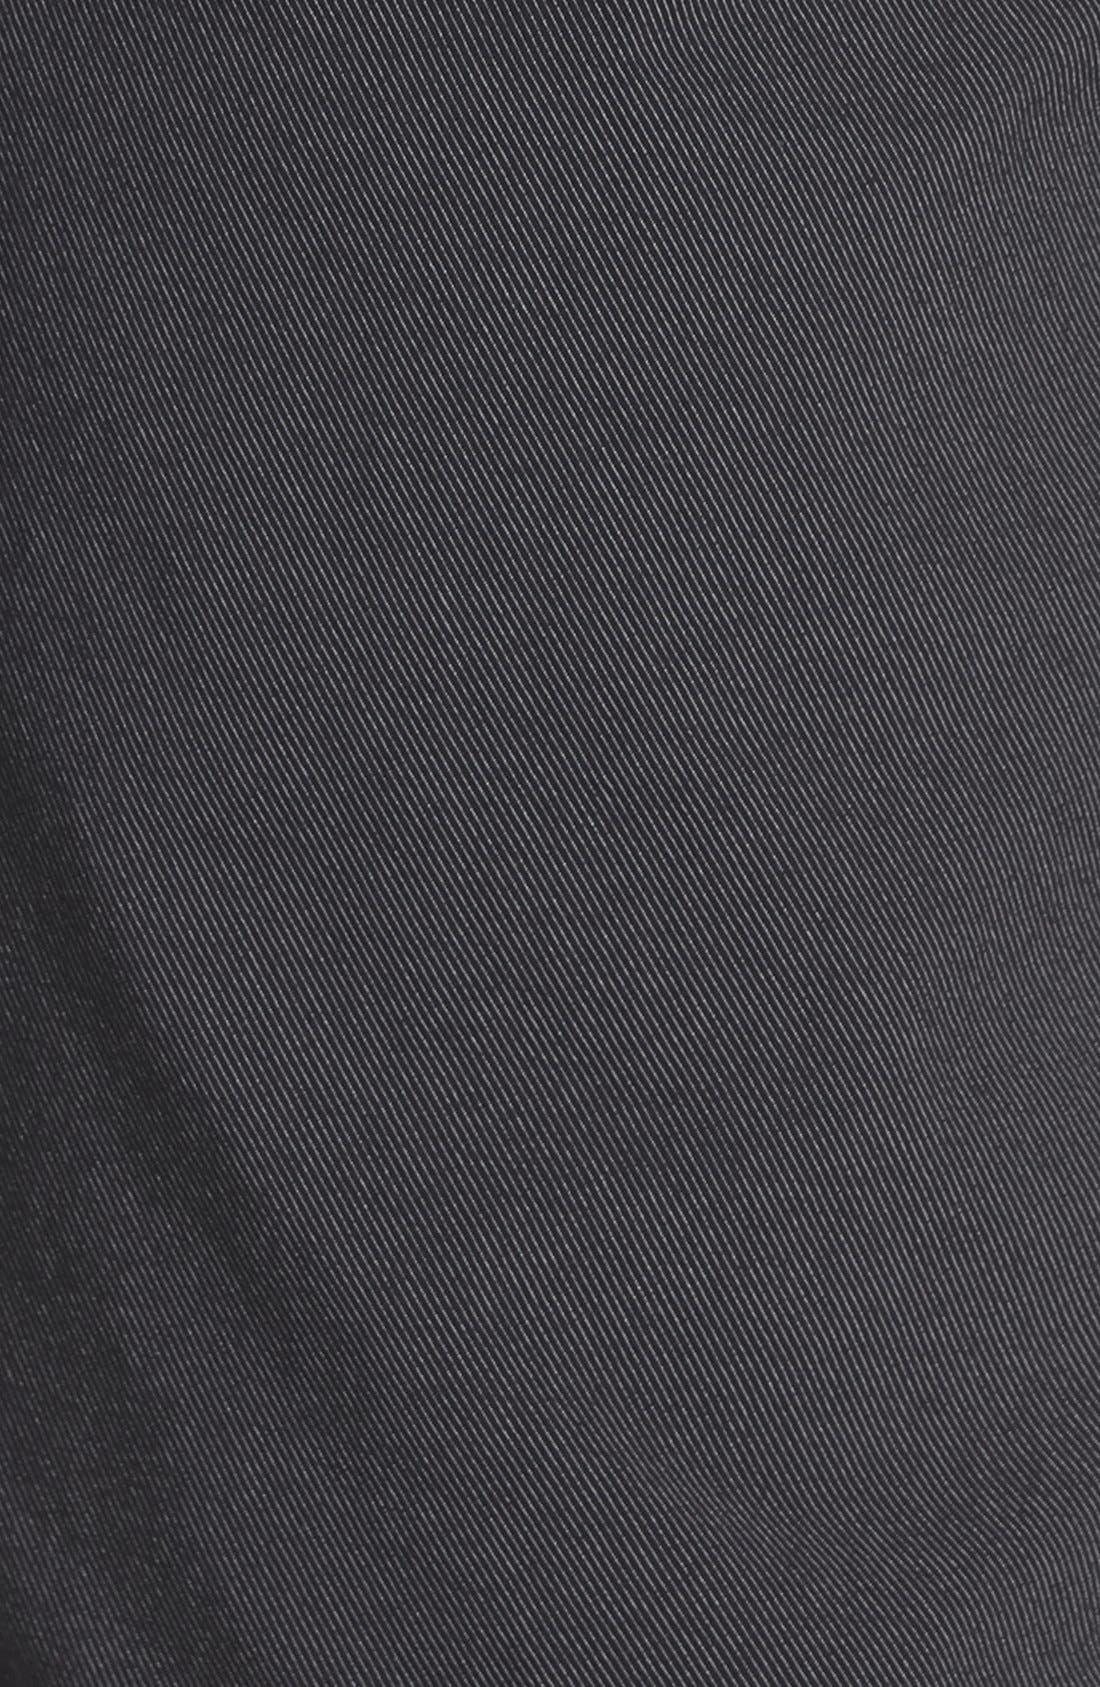 'Hefner' Stretch Golf Shorts,                             Alternate thumbnail 3, color,                             BLACK